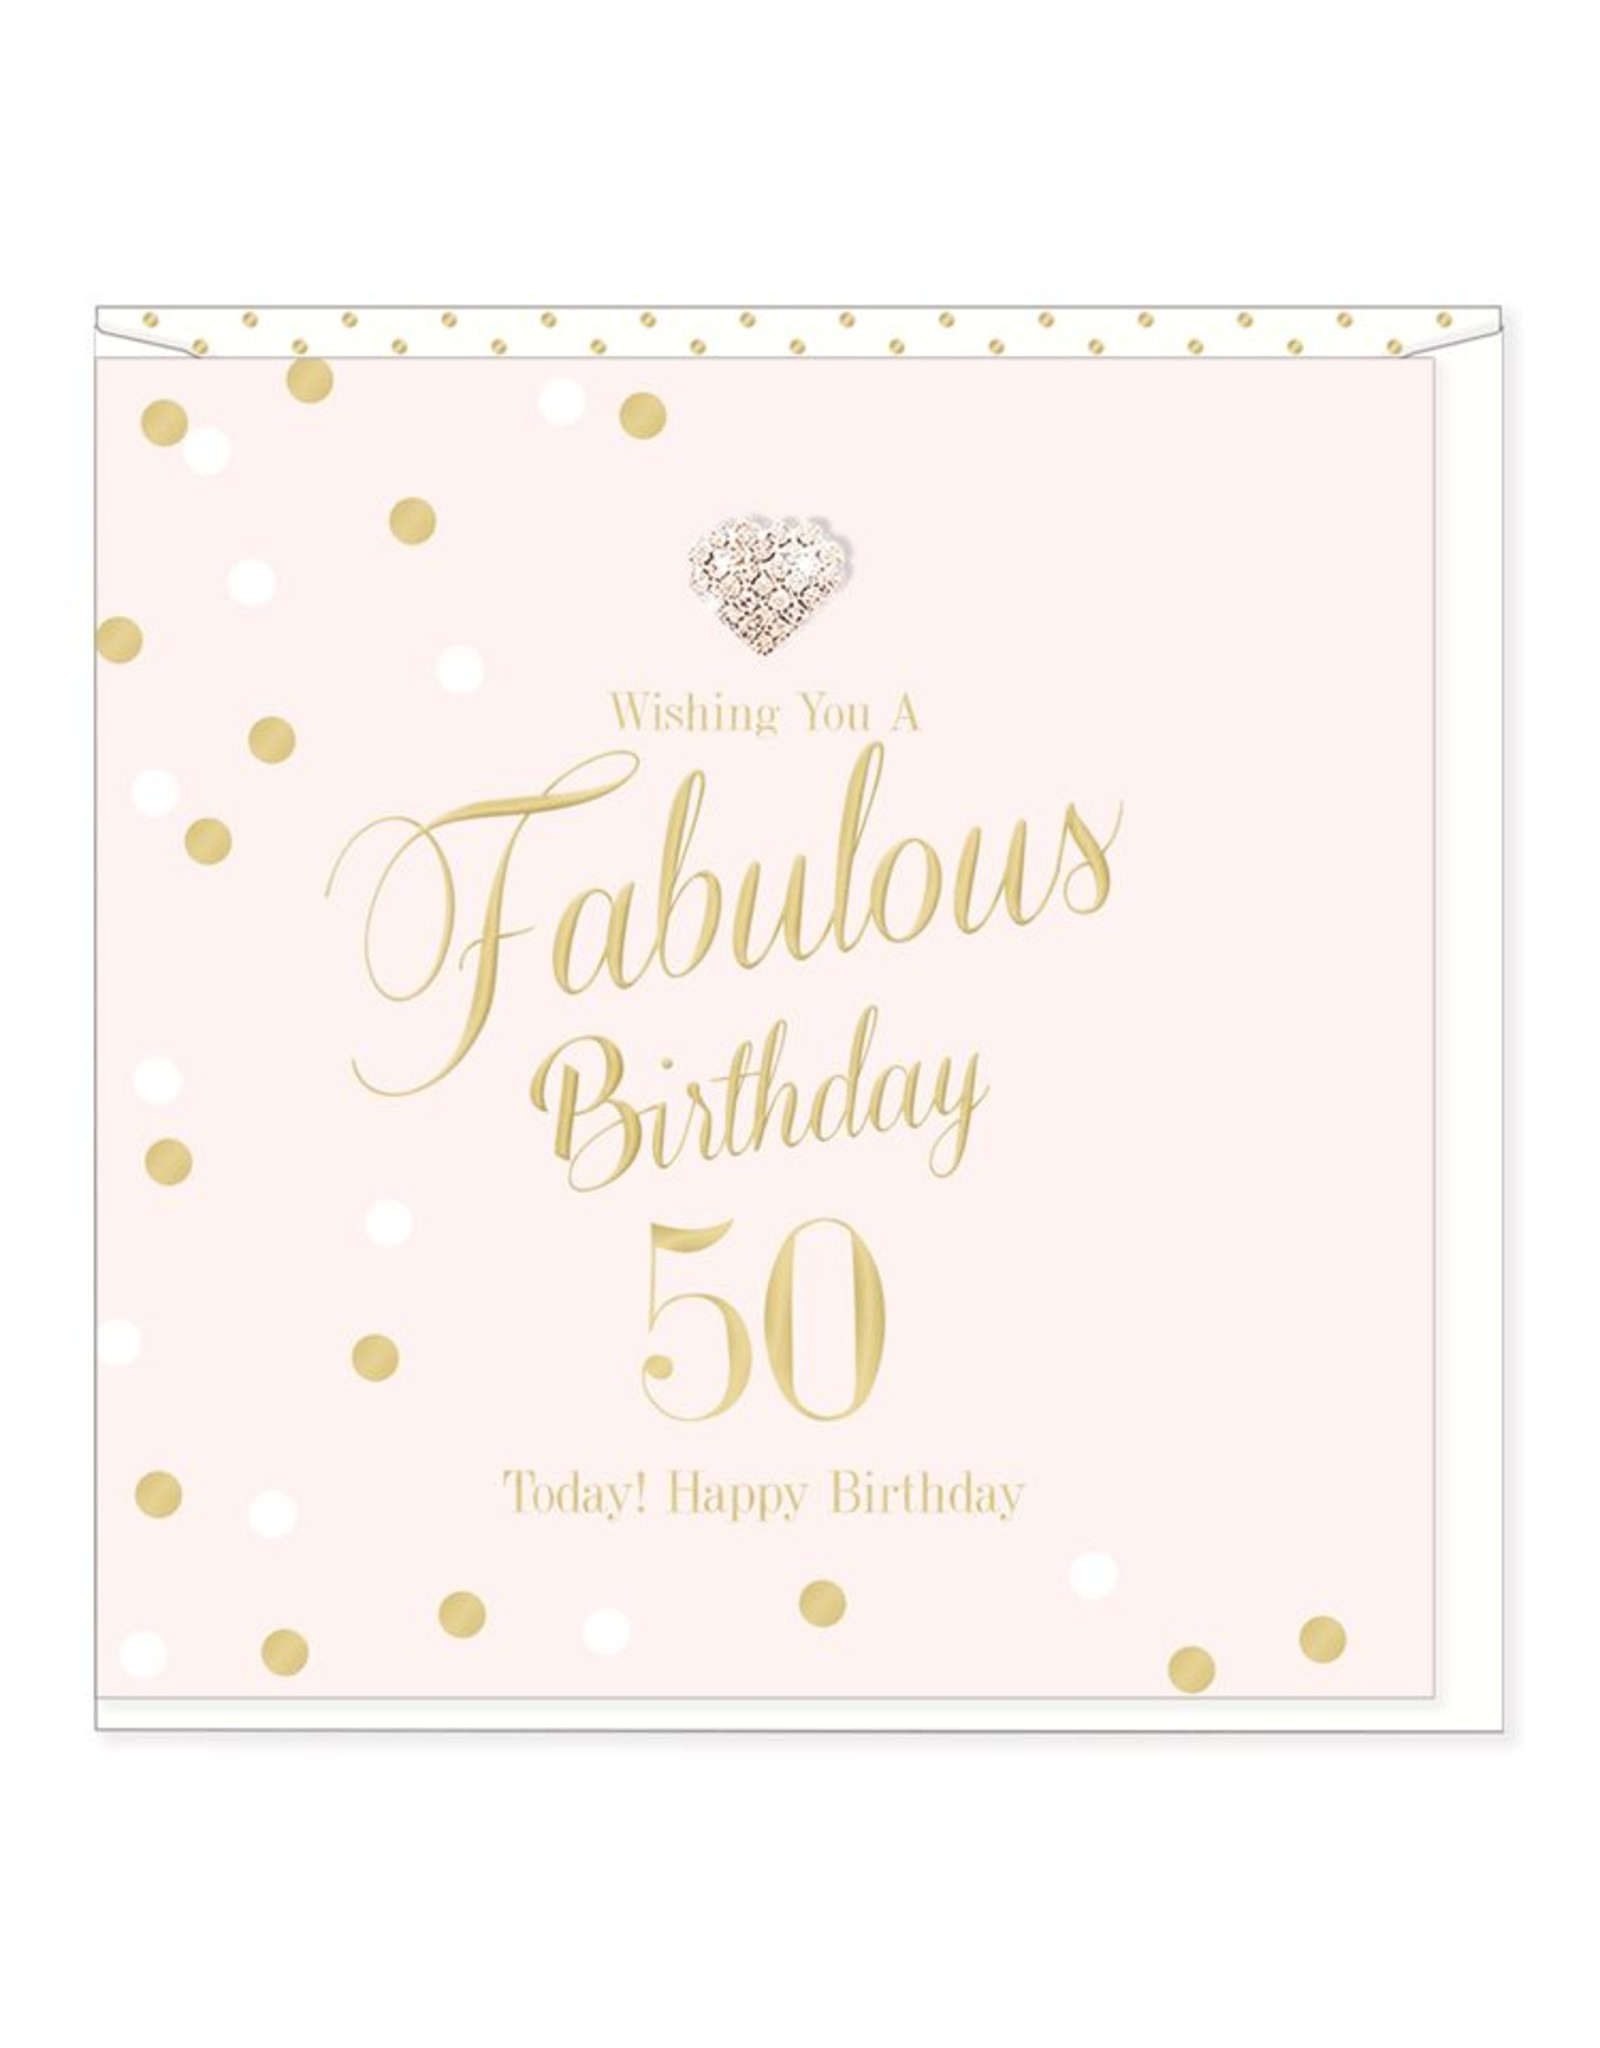 Hearts Design Wenskaart - Fabulous Birthday - 50